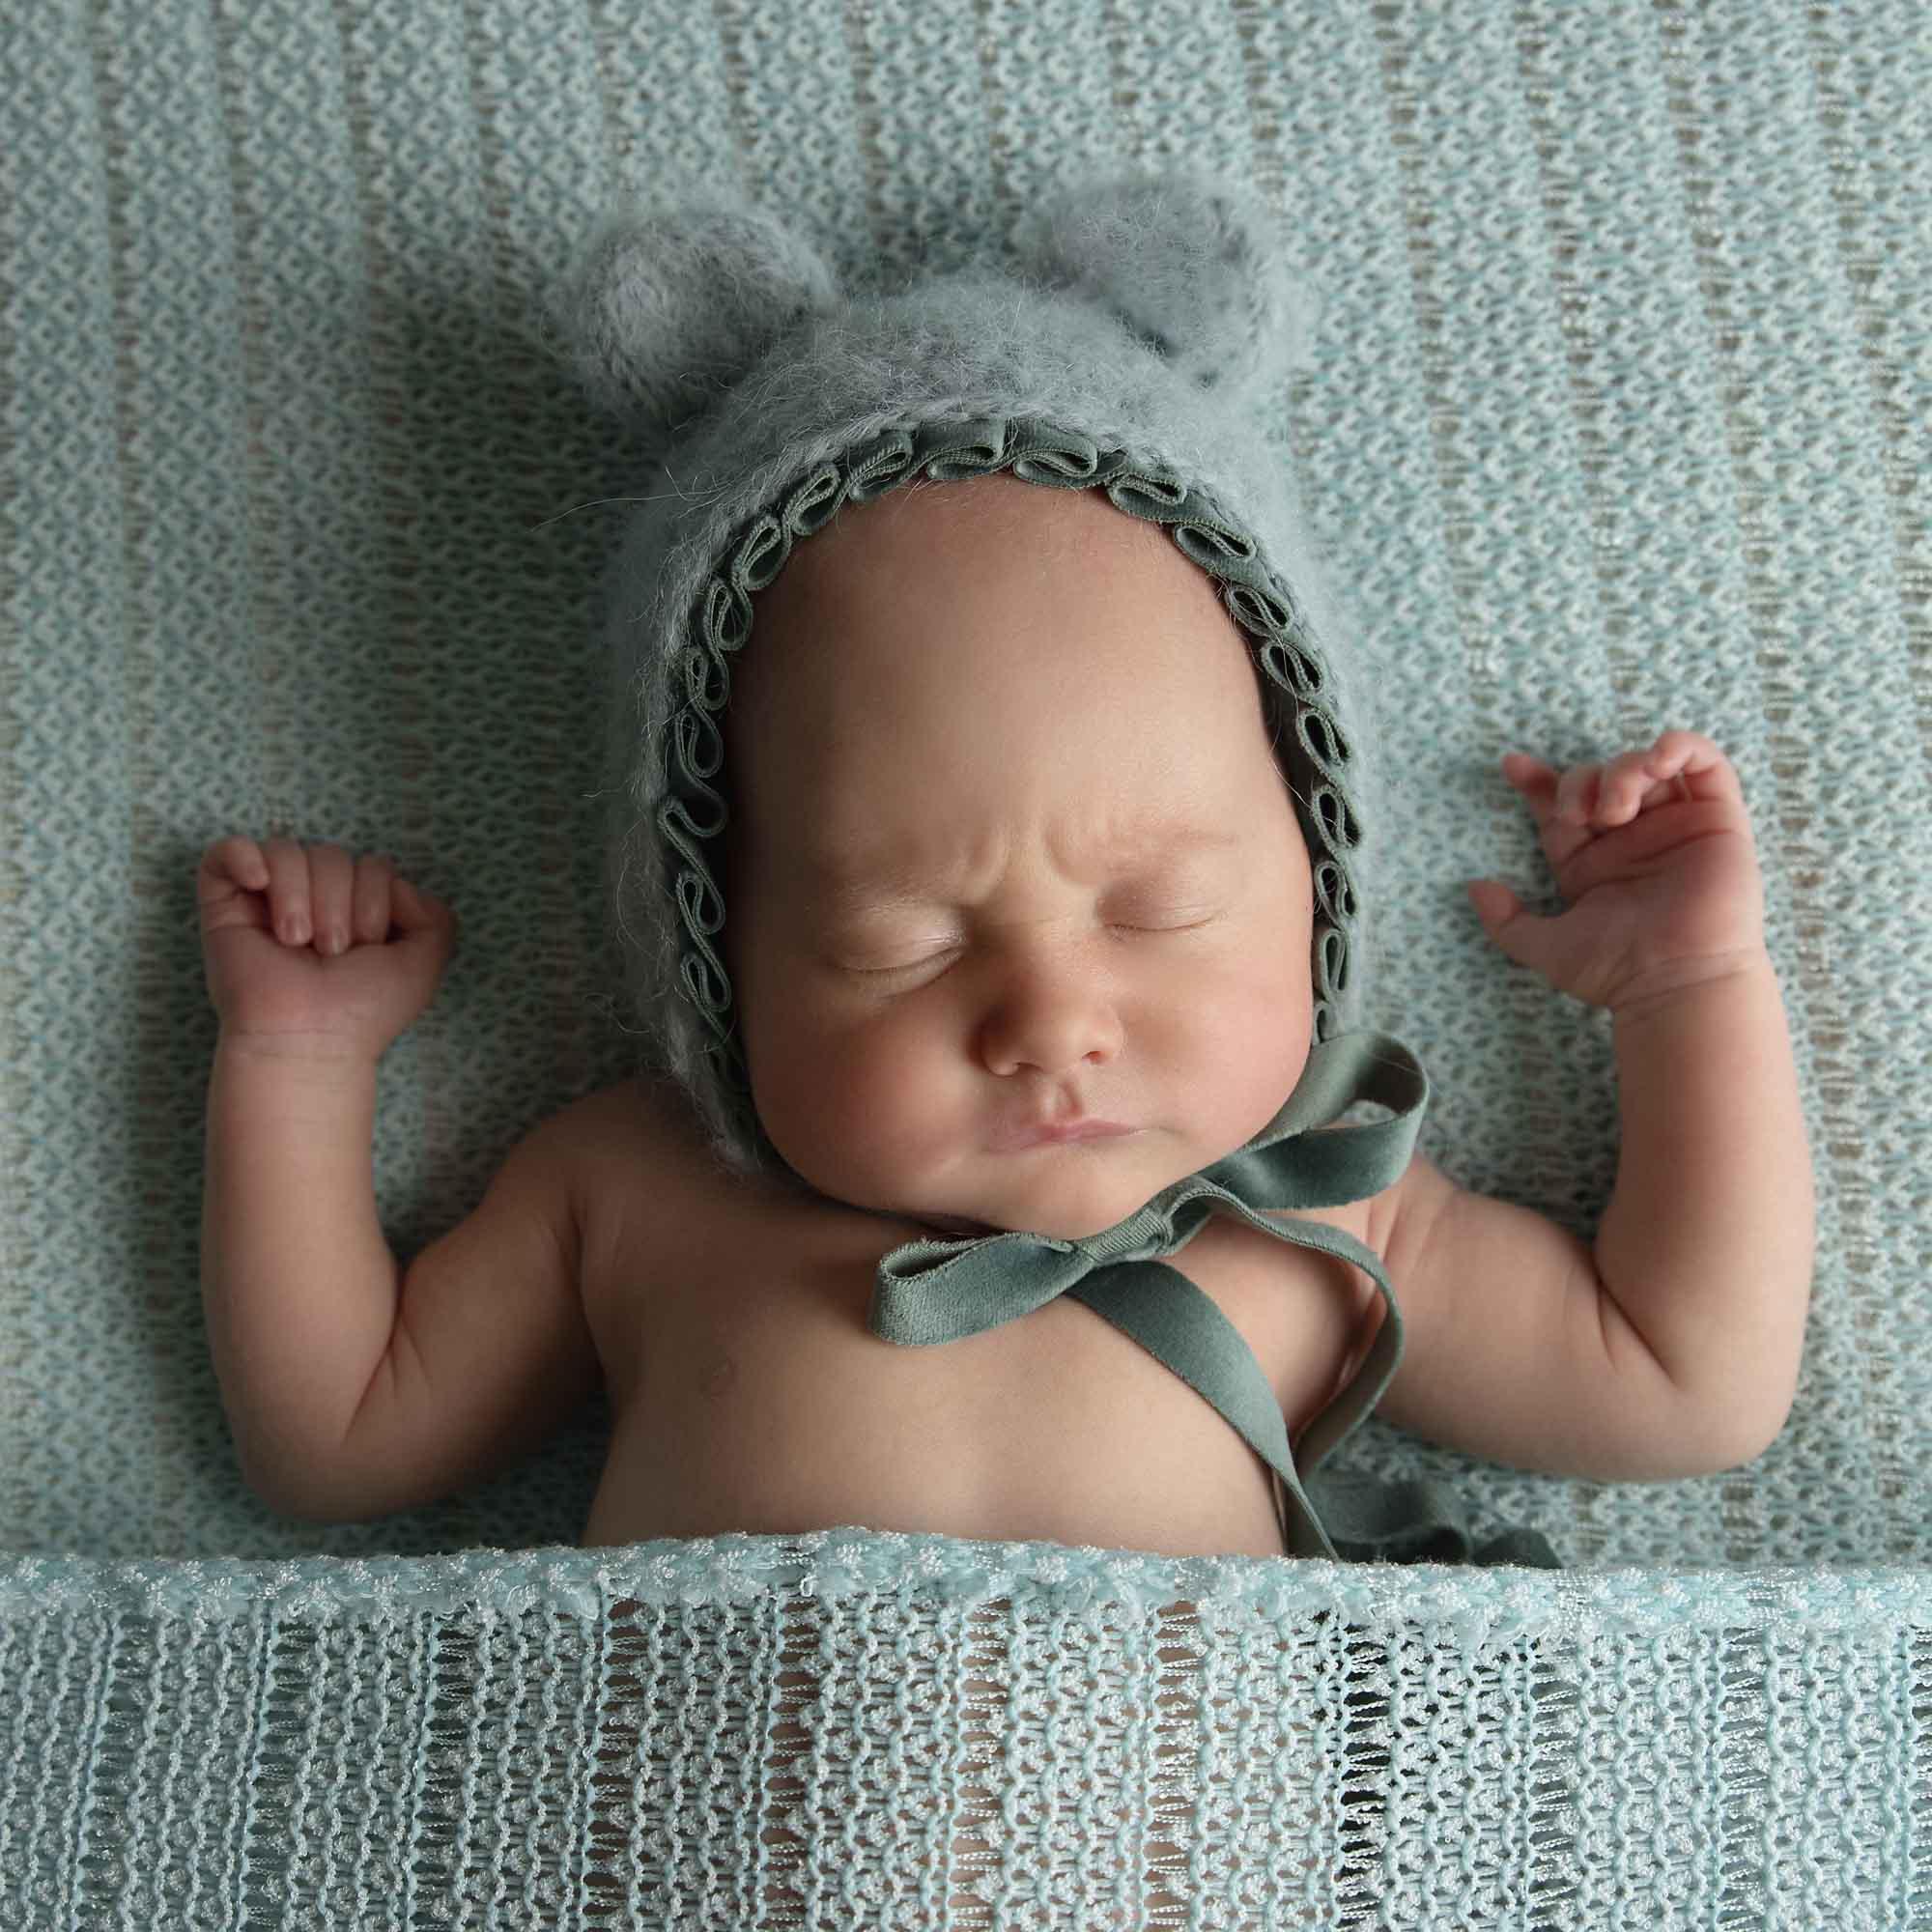 newborn baby boy in mint teddy set photographed by Newborn Photographer Cheshire